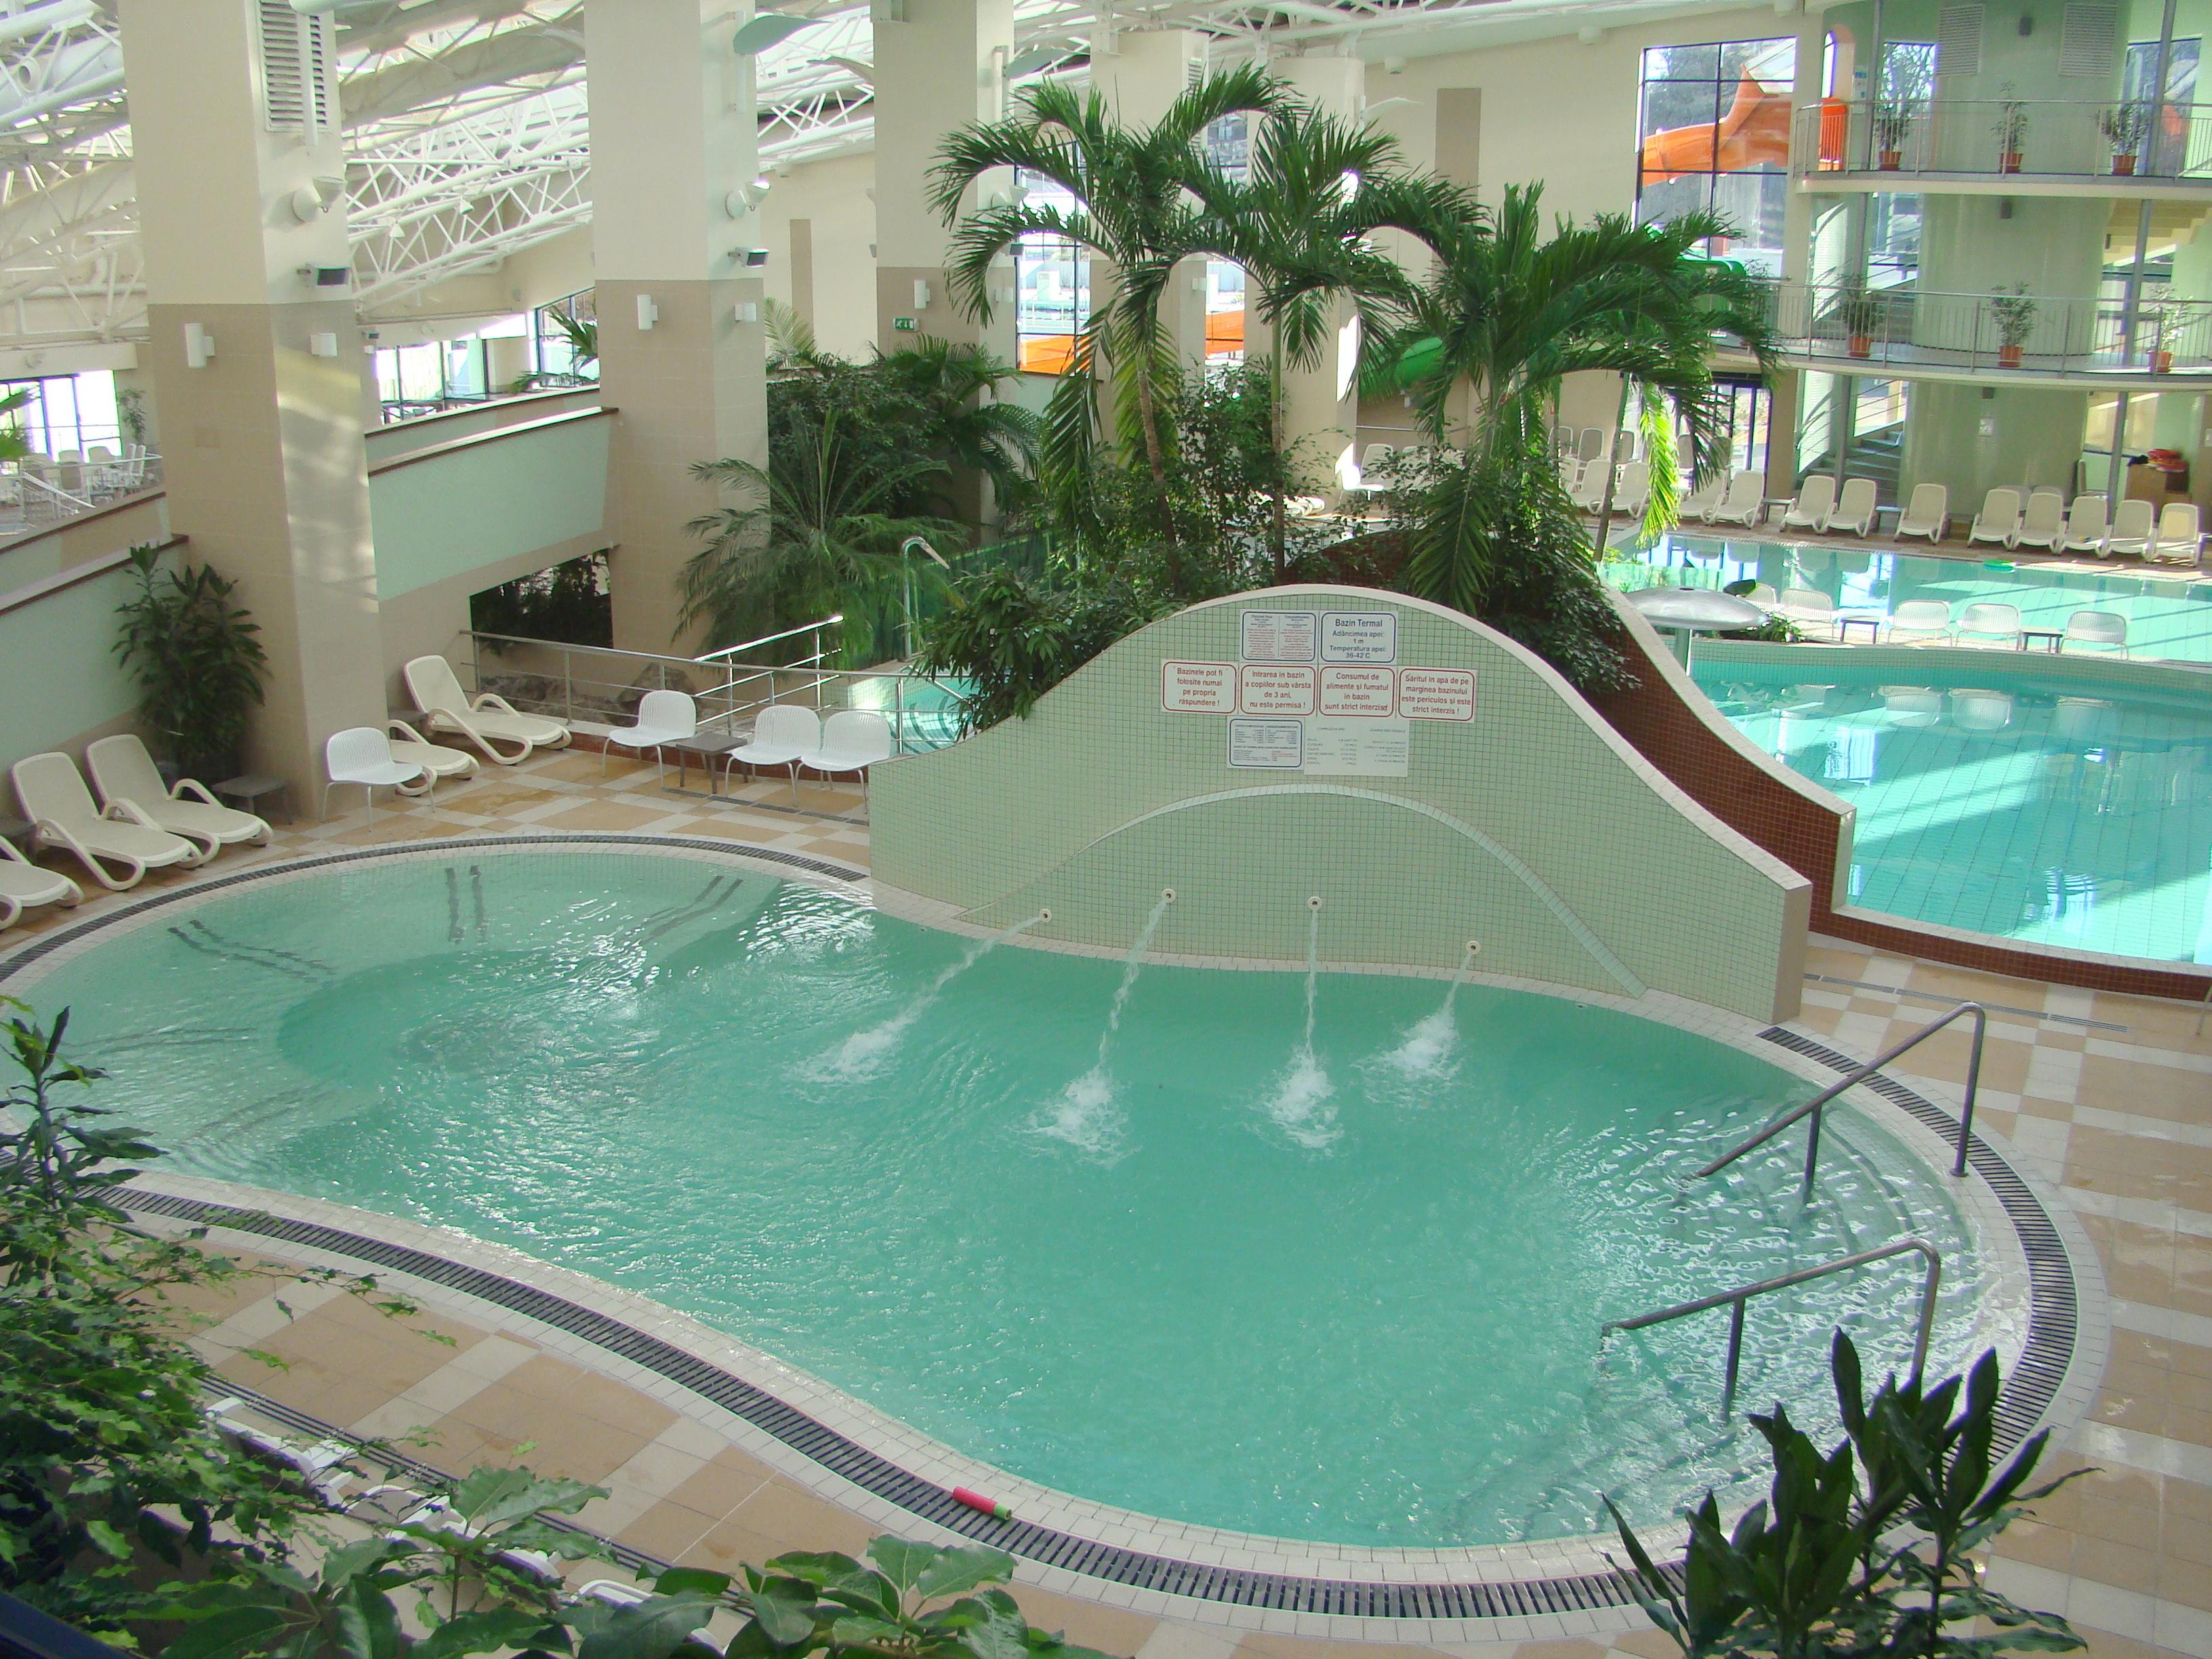 Lotus Therm Hotel Spa Baile Felix